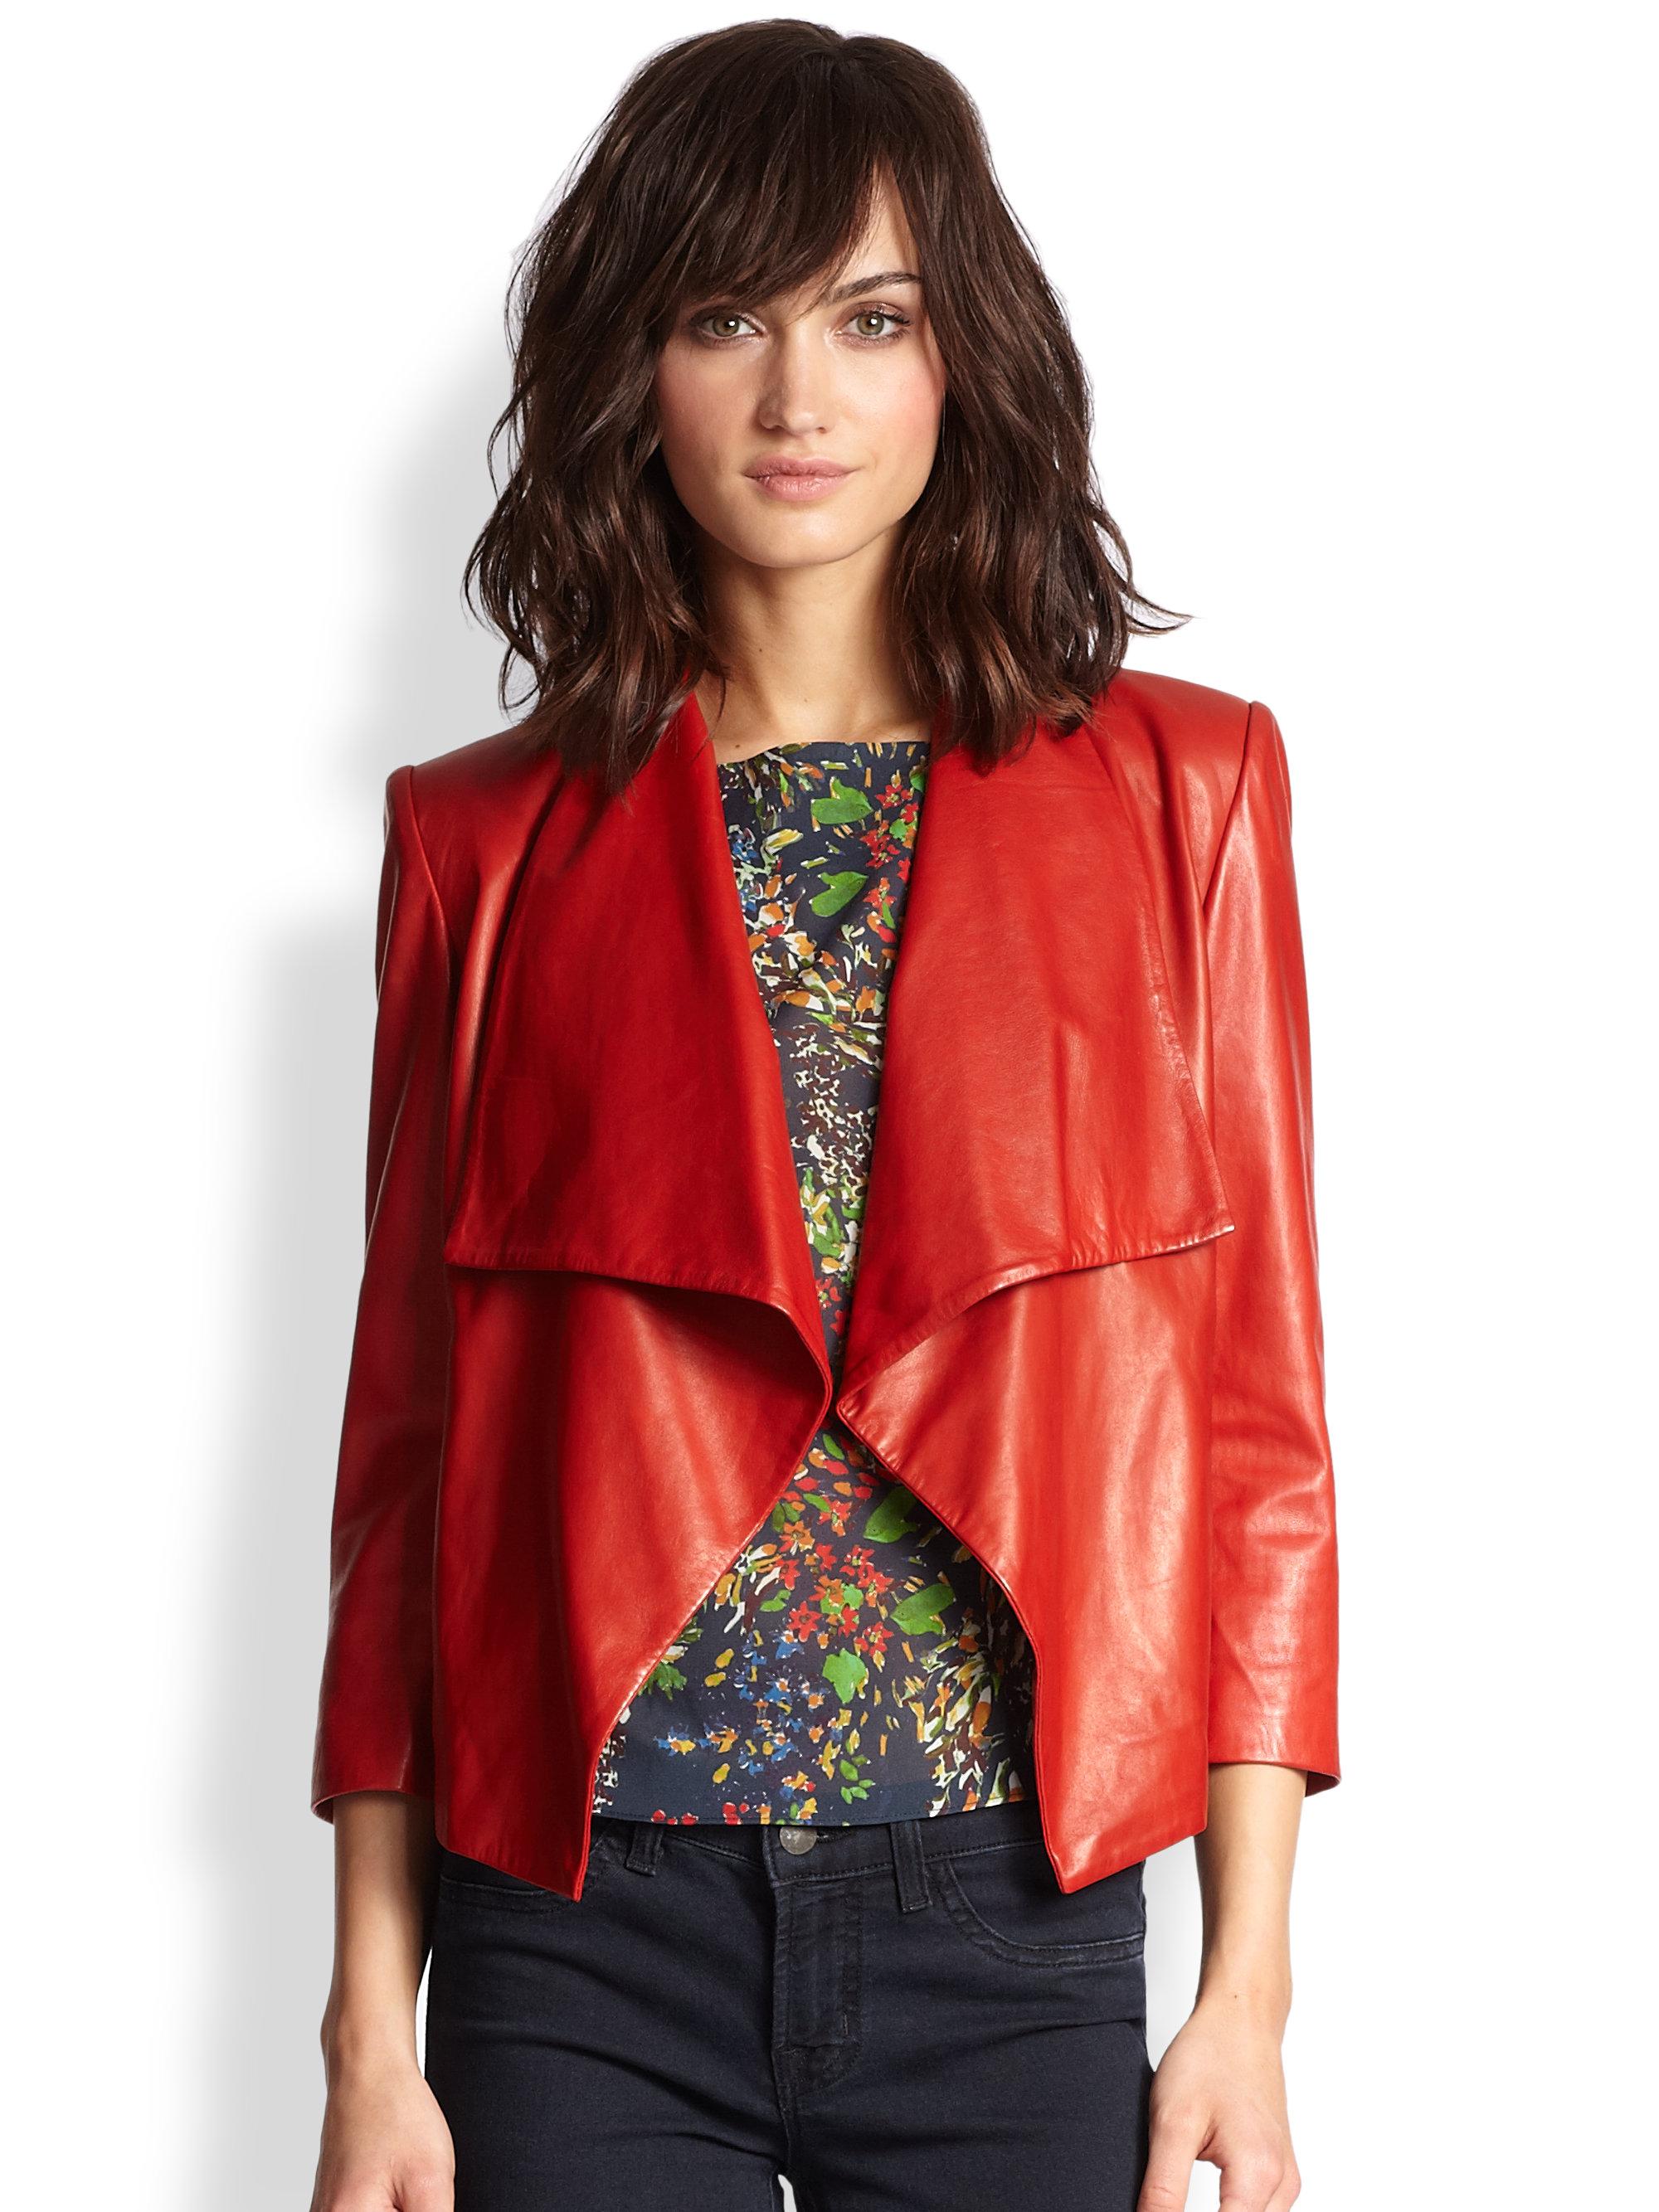 Alice and olivia leather jacket